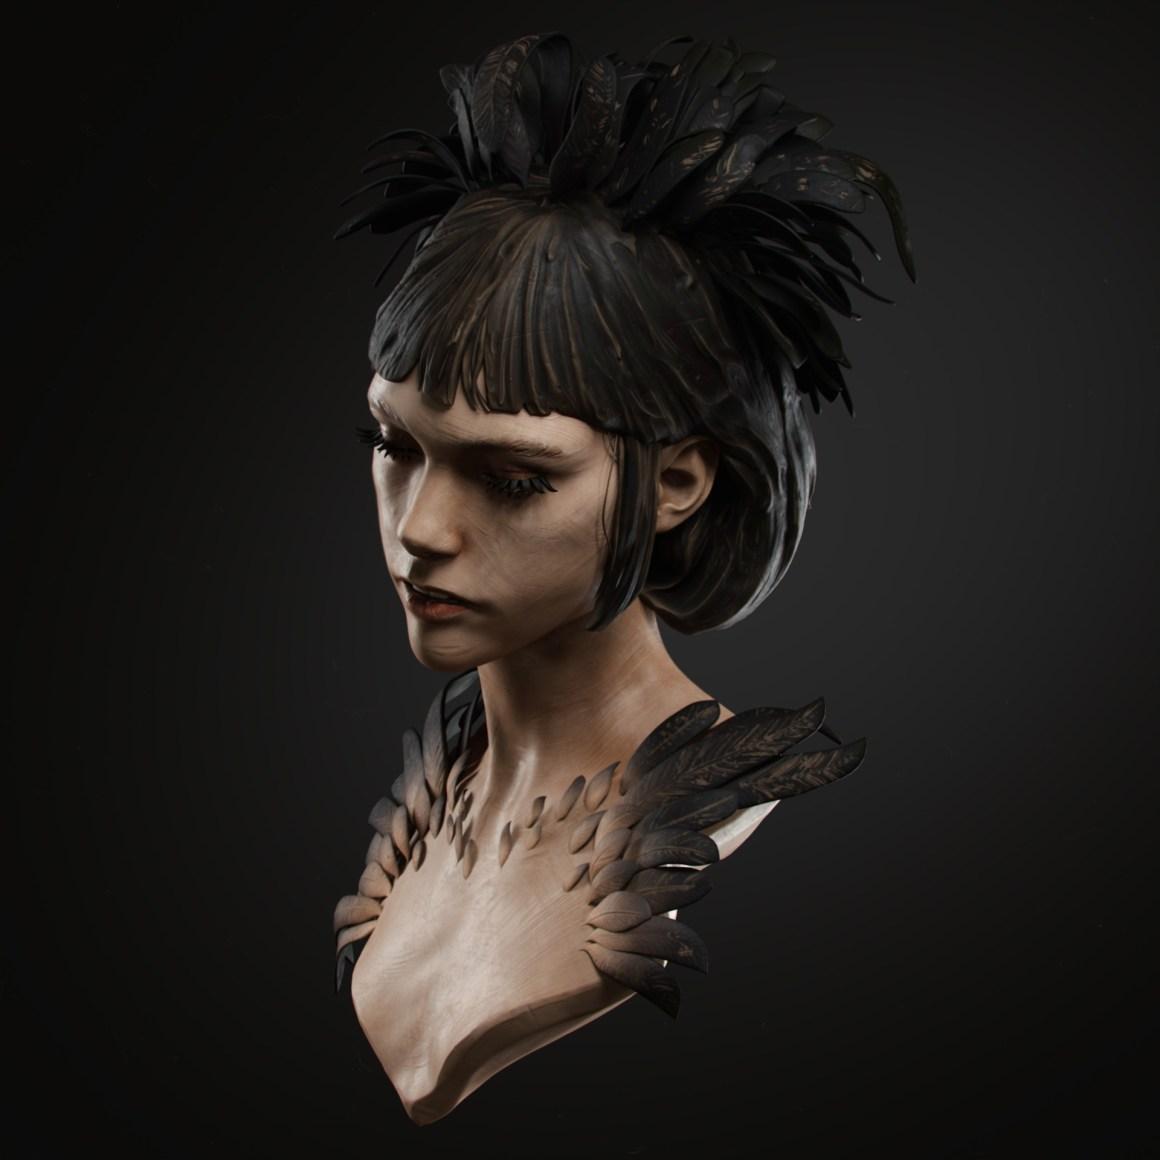 Noir portrait by Dmitry Danilov